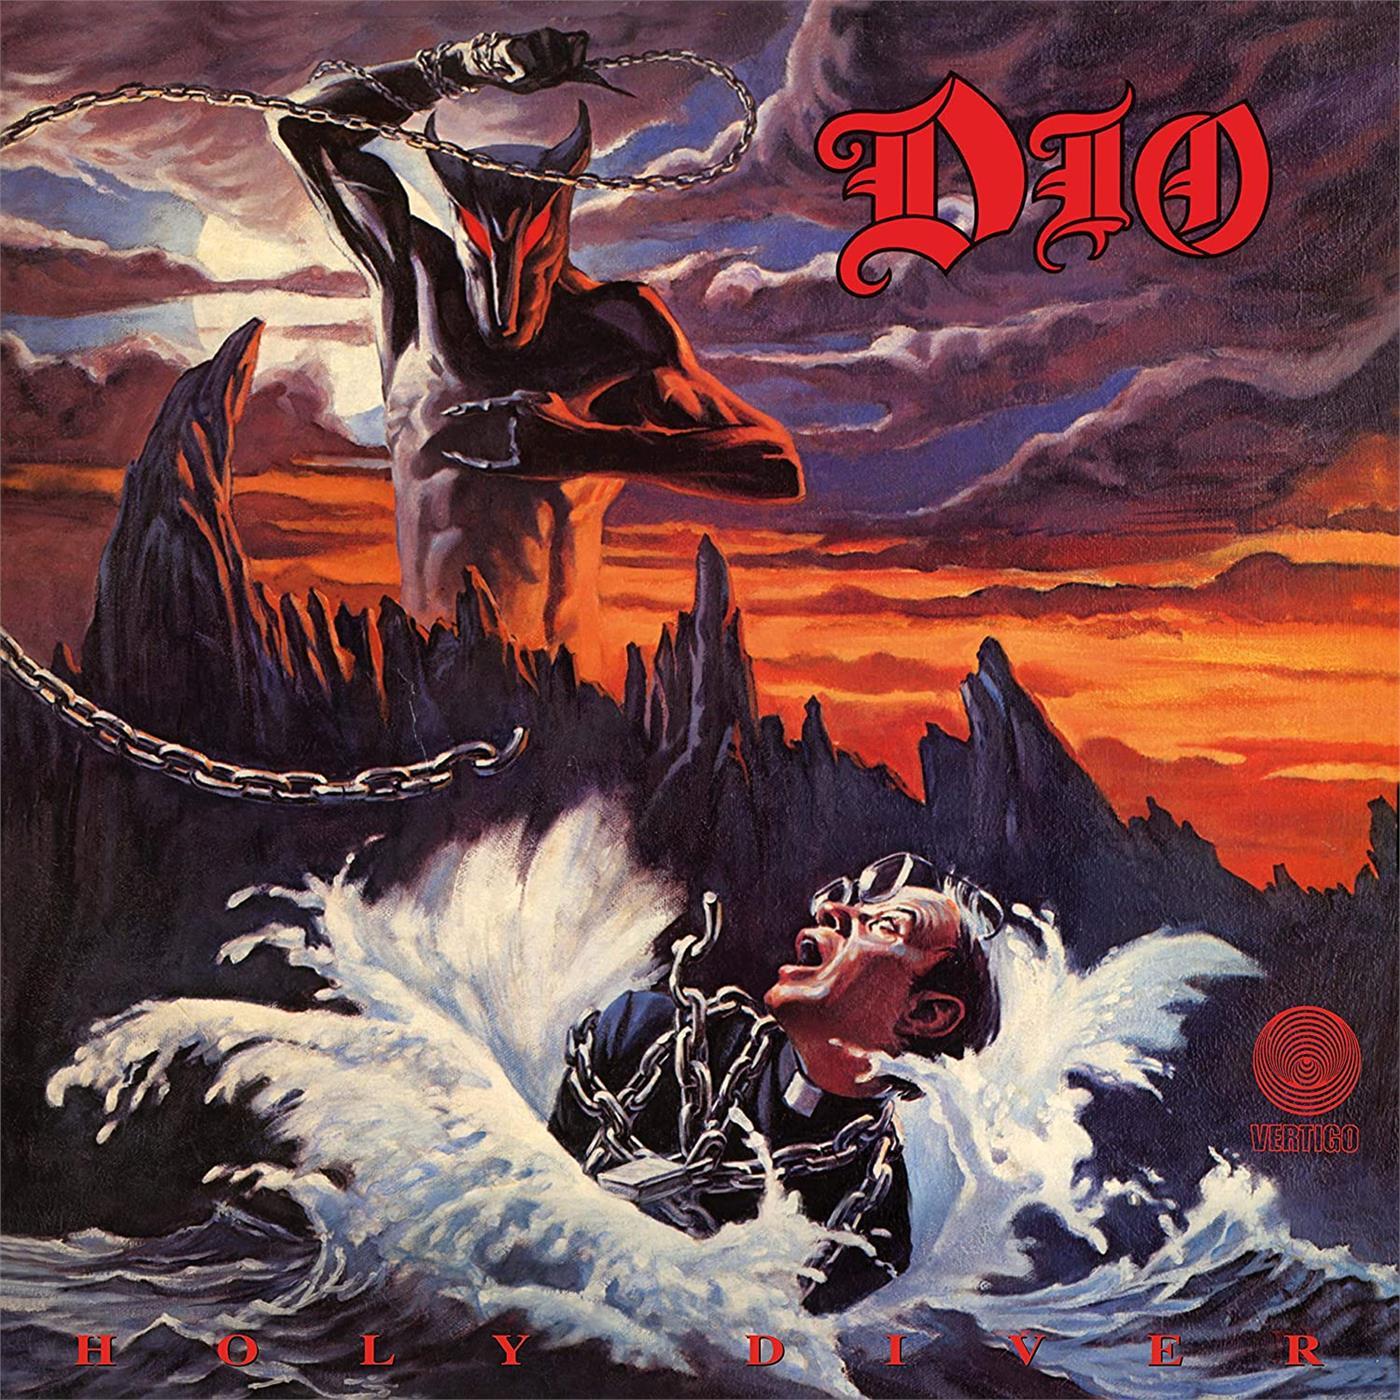 Dio - Holy Diver [LP]